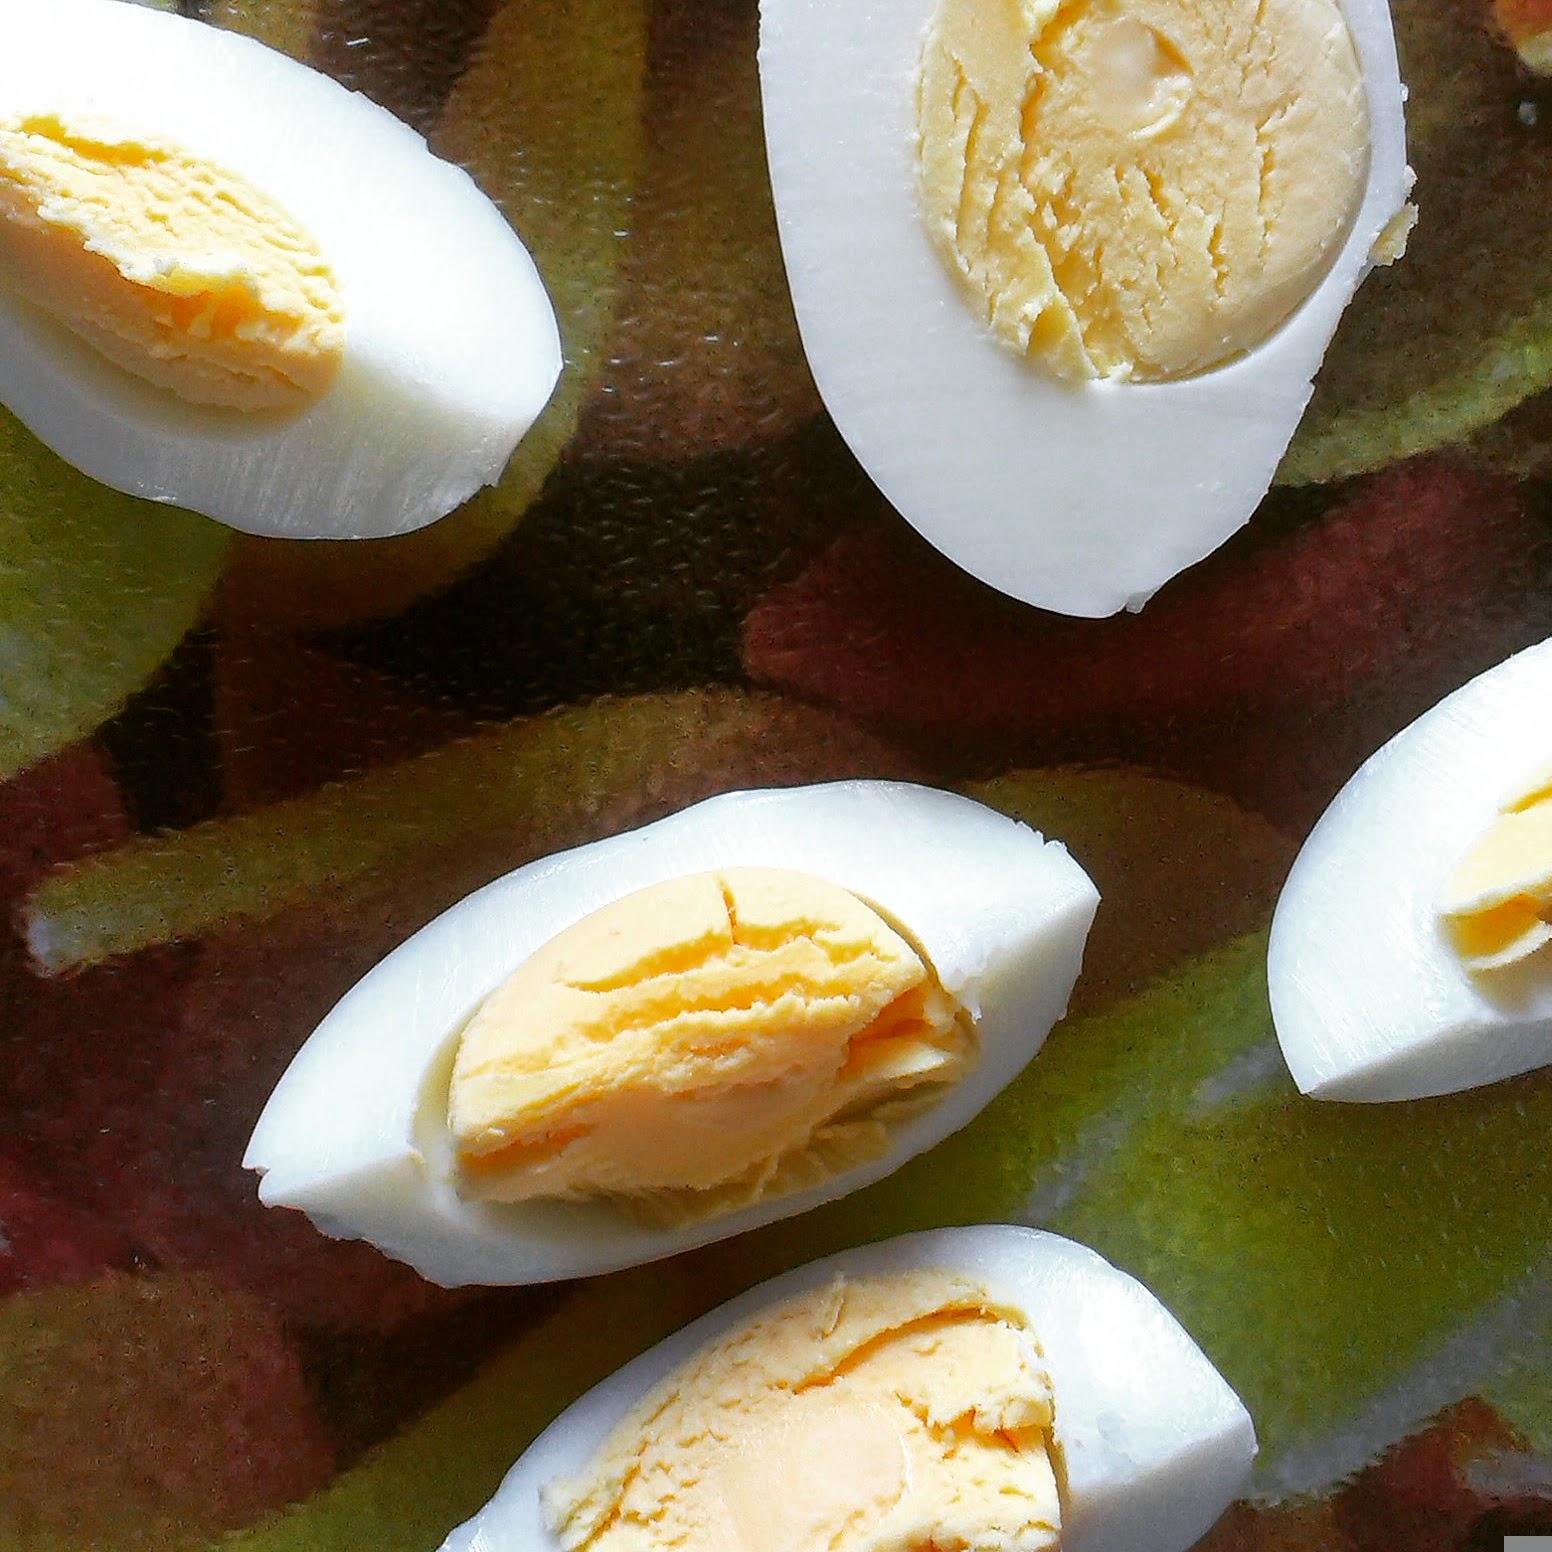 10am - hard boiled eggs